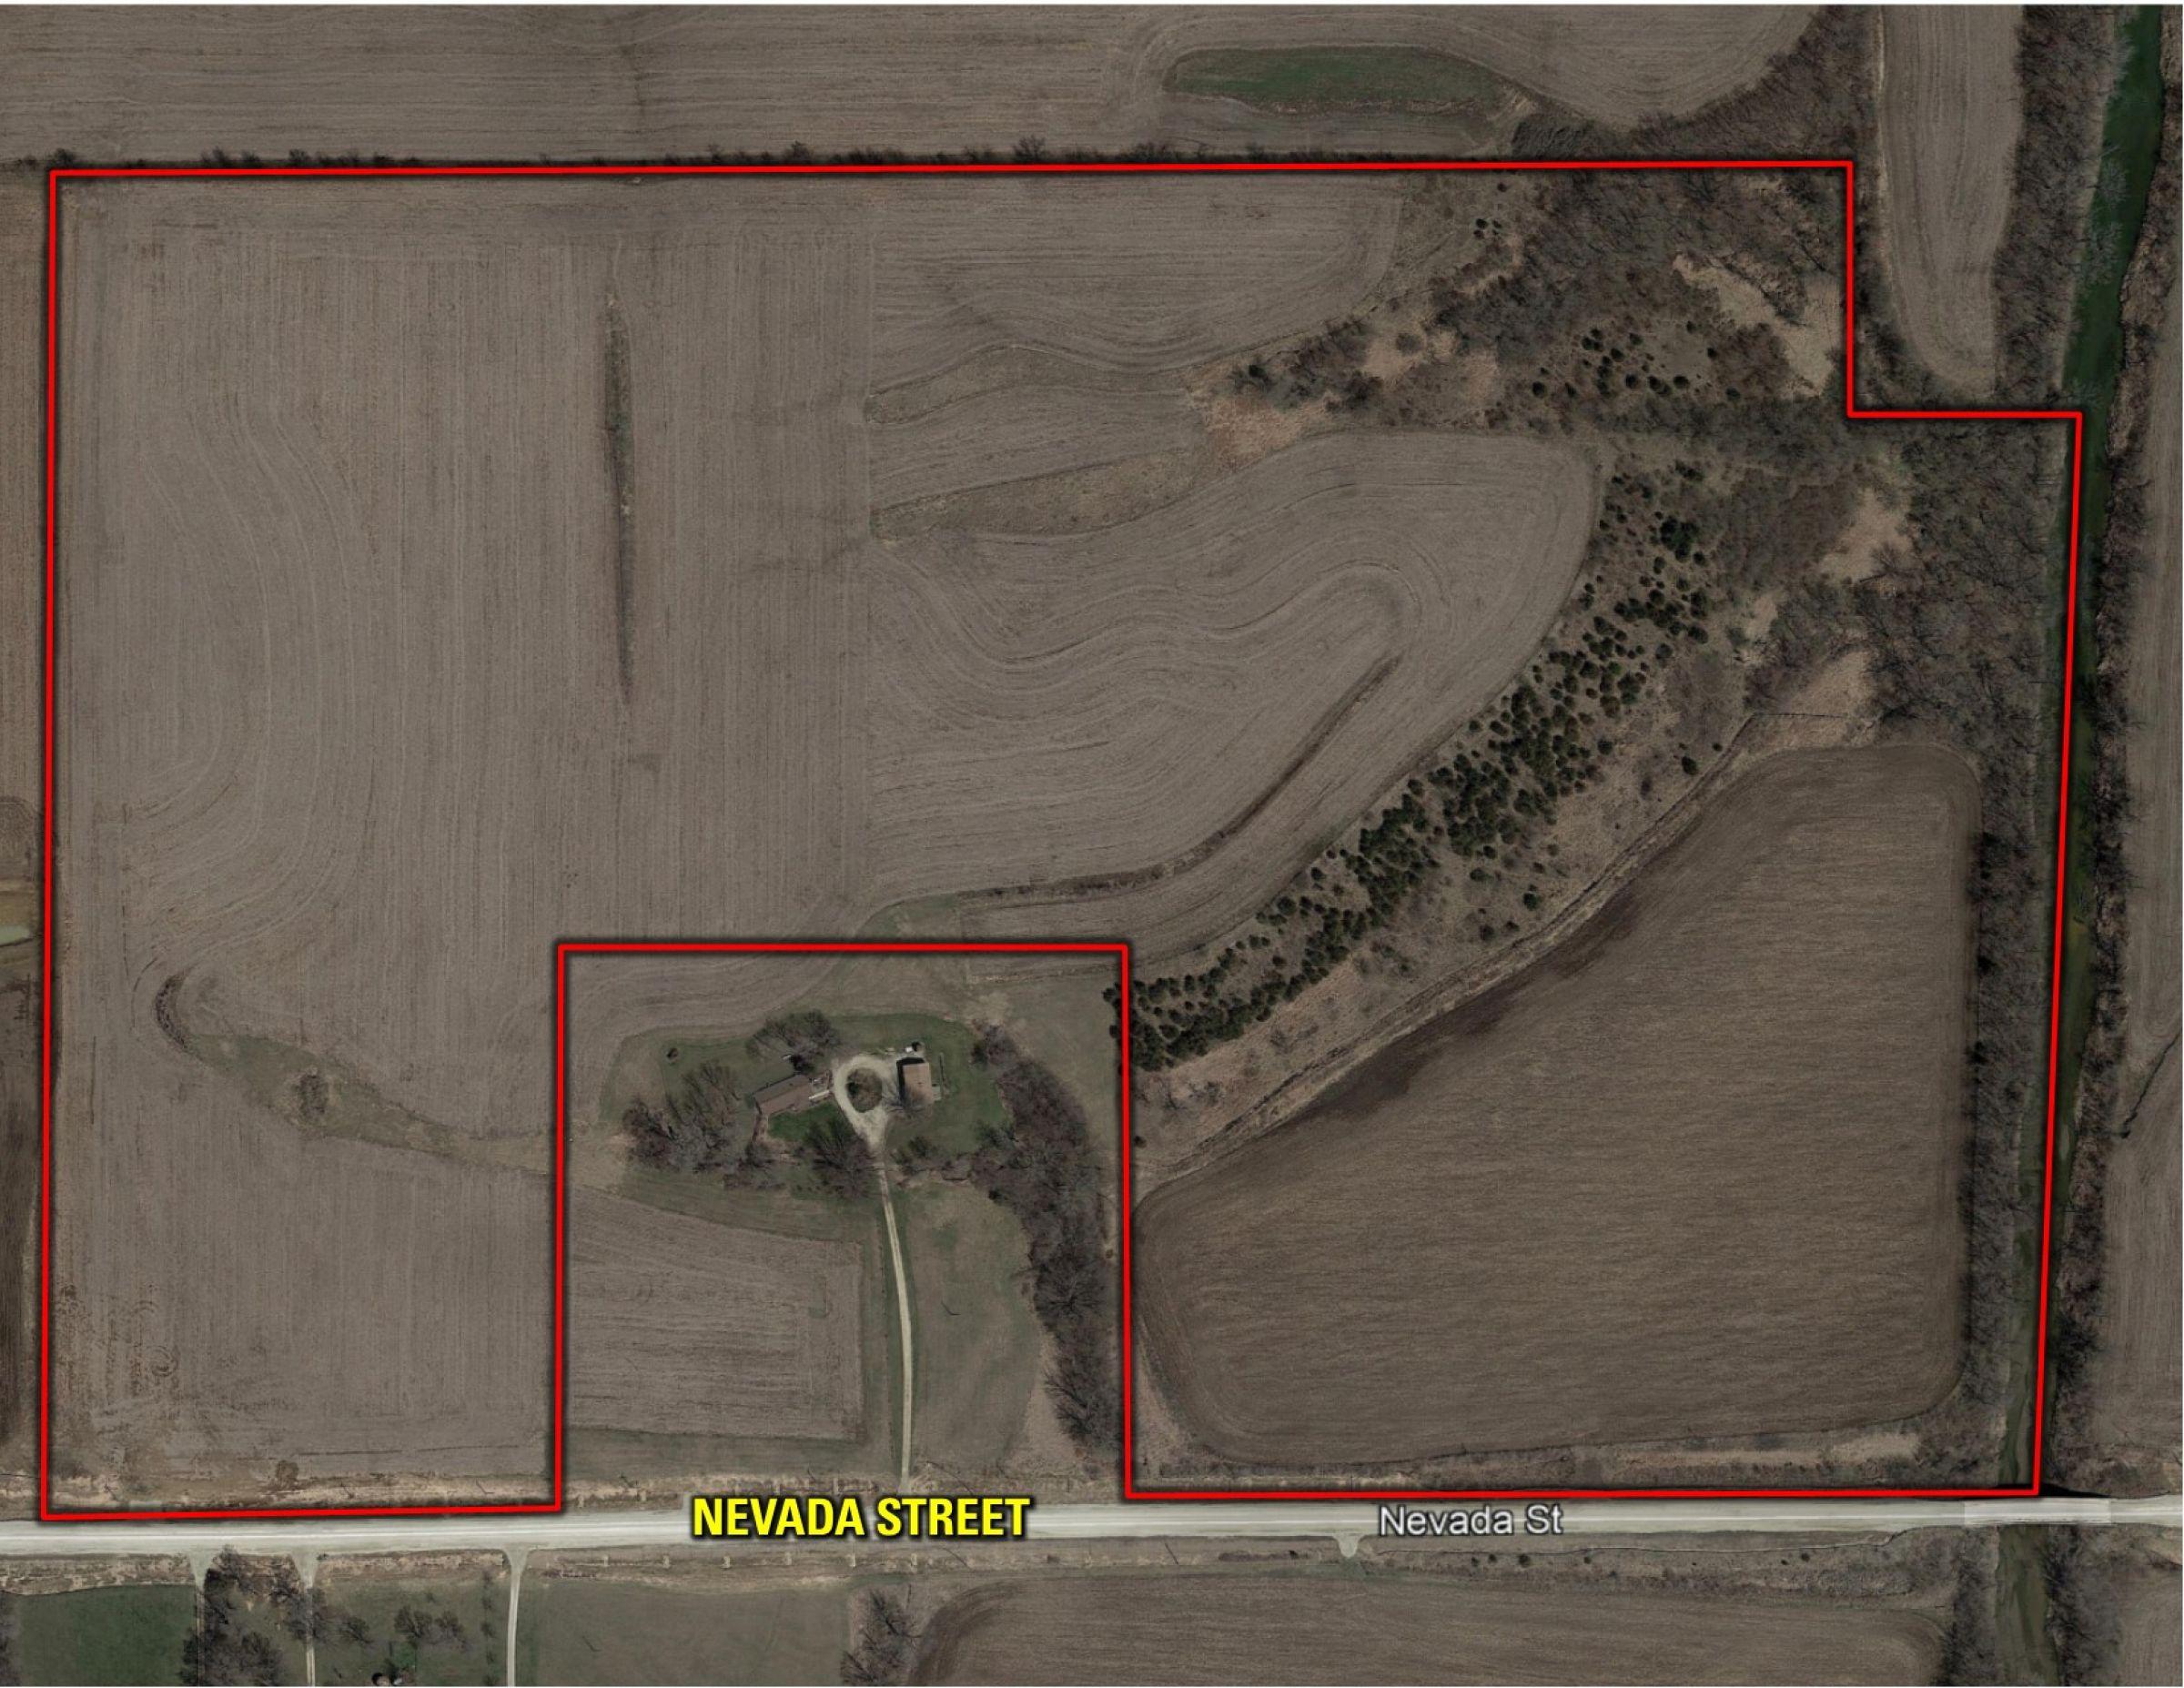 Peoples Company land for sale-Warren County Iowa-14341-nevada-st-indianola-50125.jpg